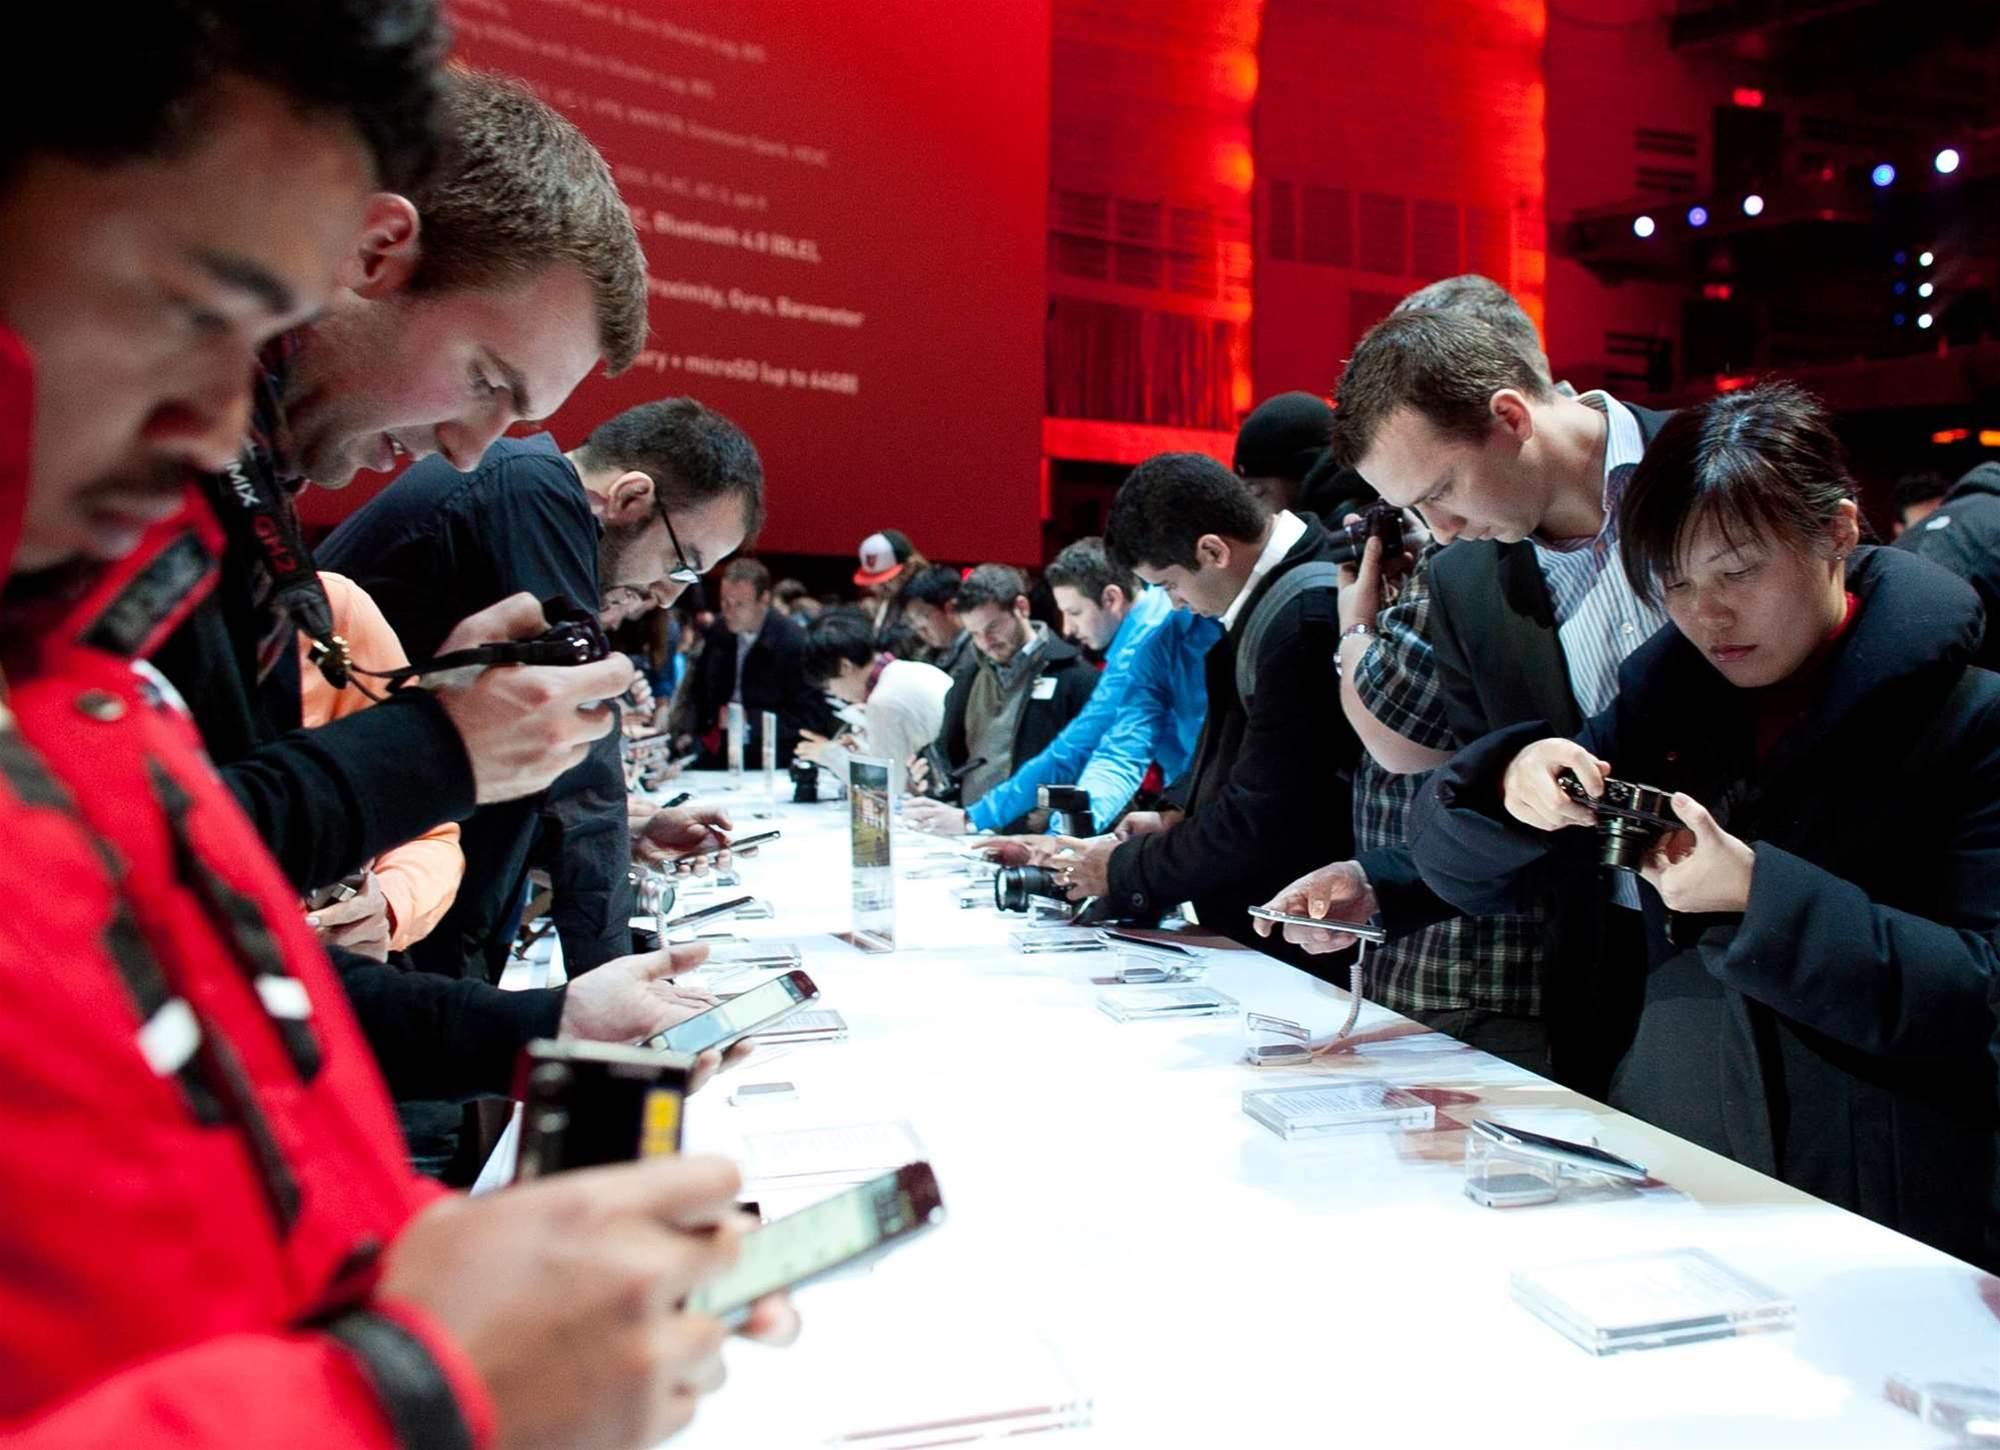 St. George CIO seeks new approach to BYOD